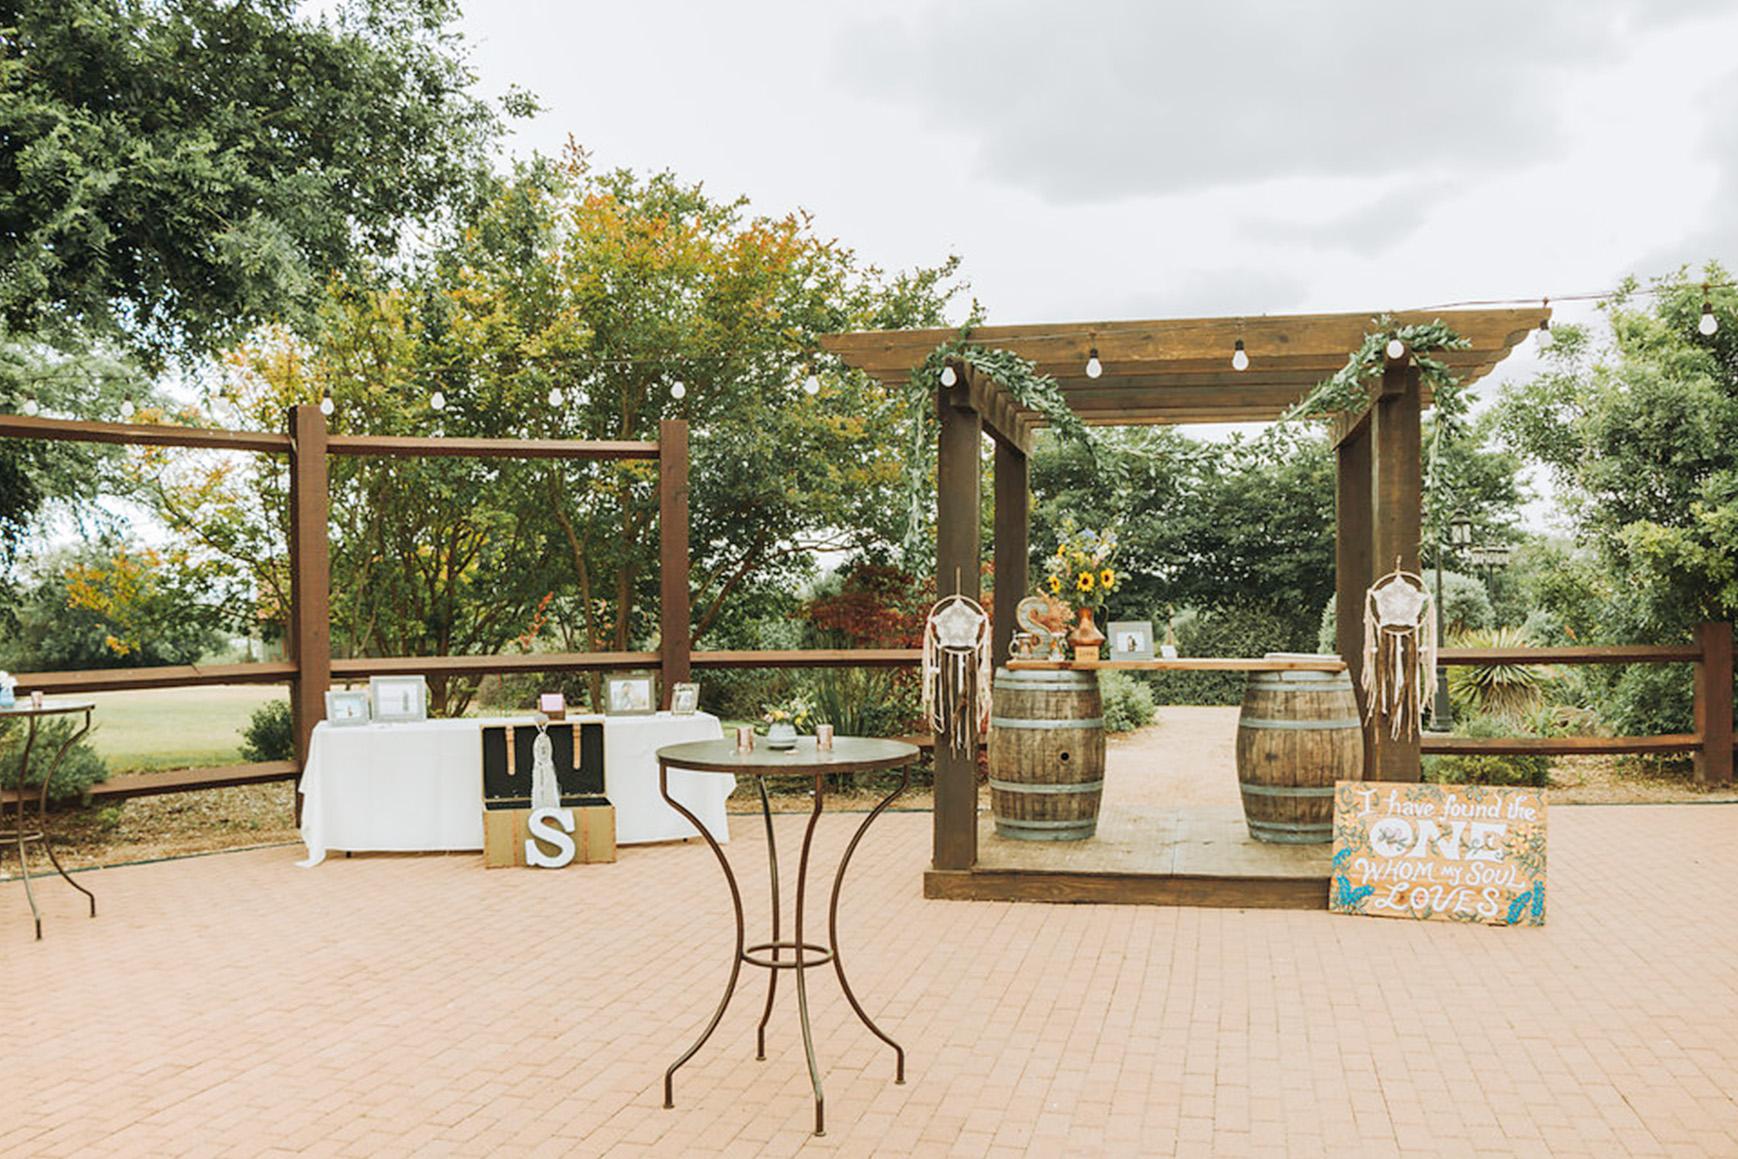 Cocktail Patio  - Hofmann Ranch - Castroville, Texas - Medina County - Wedgewood Weddings